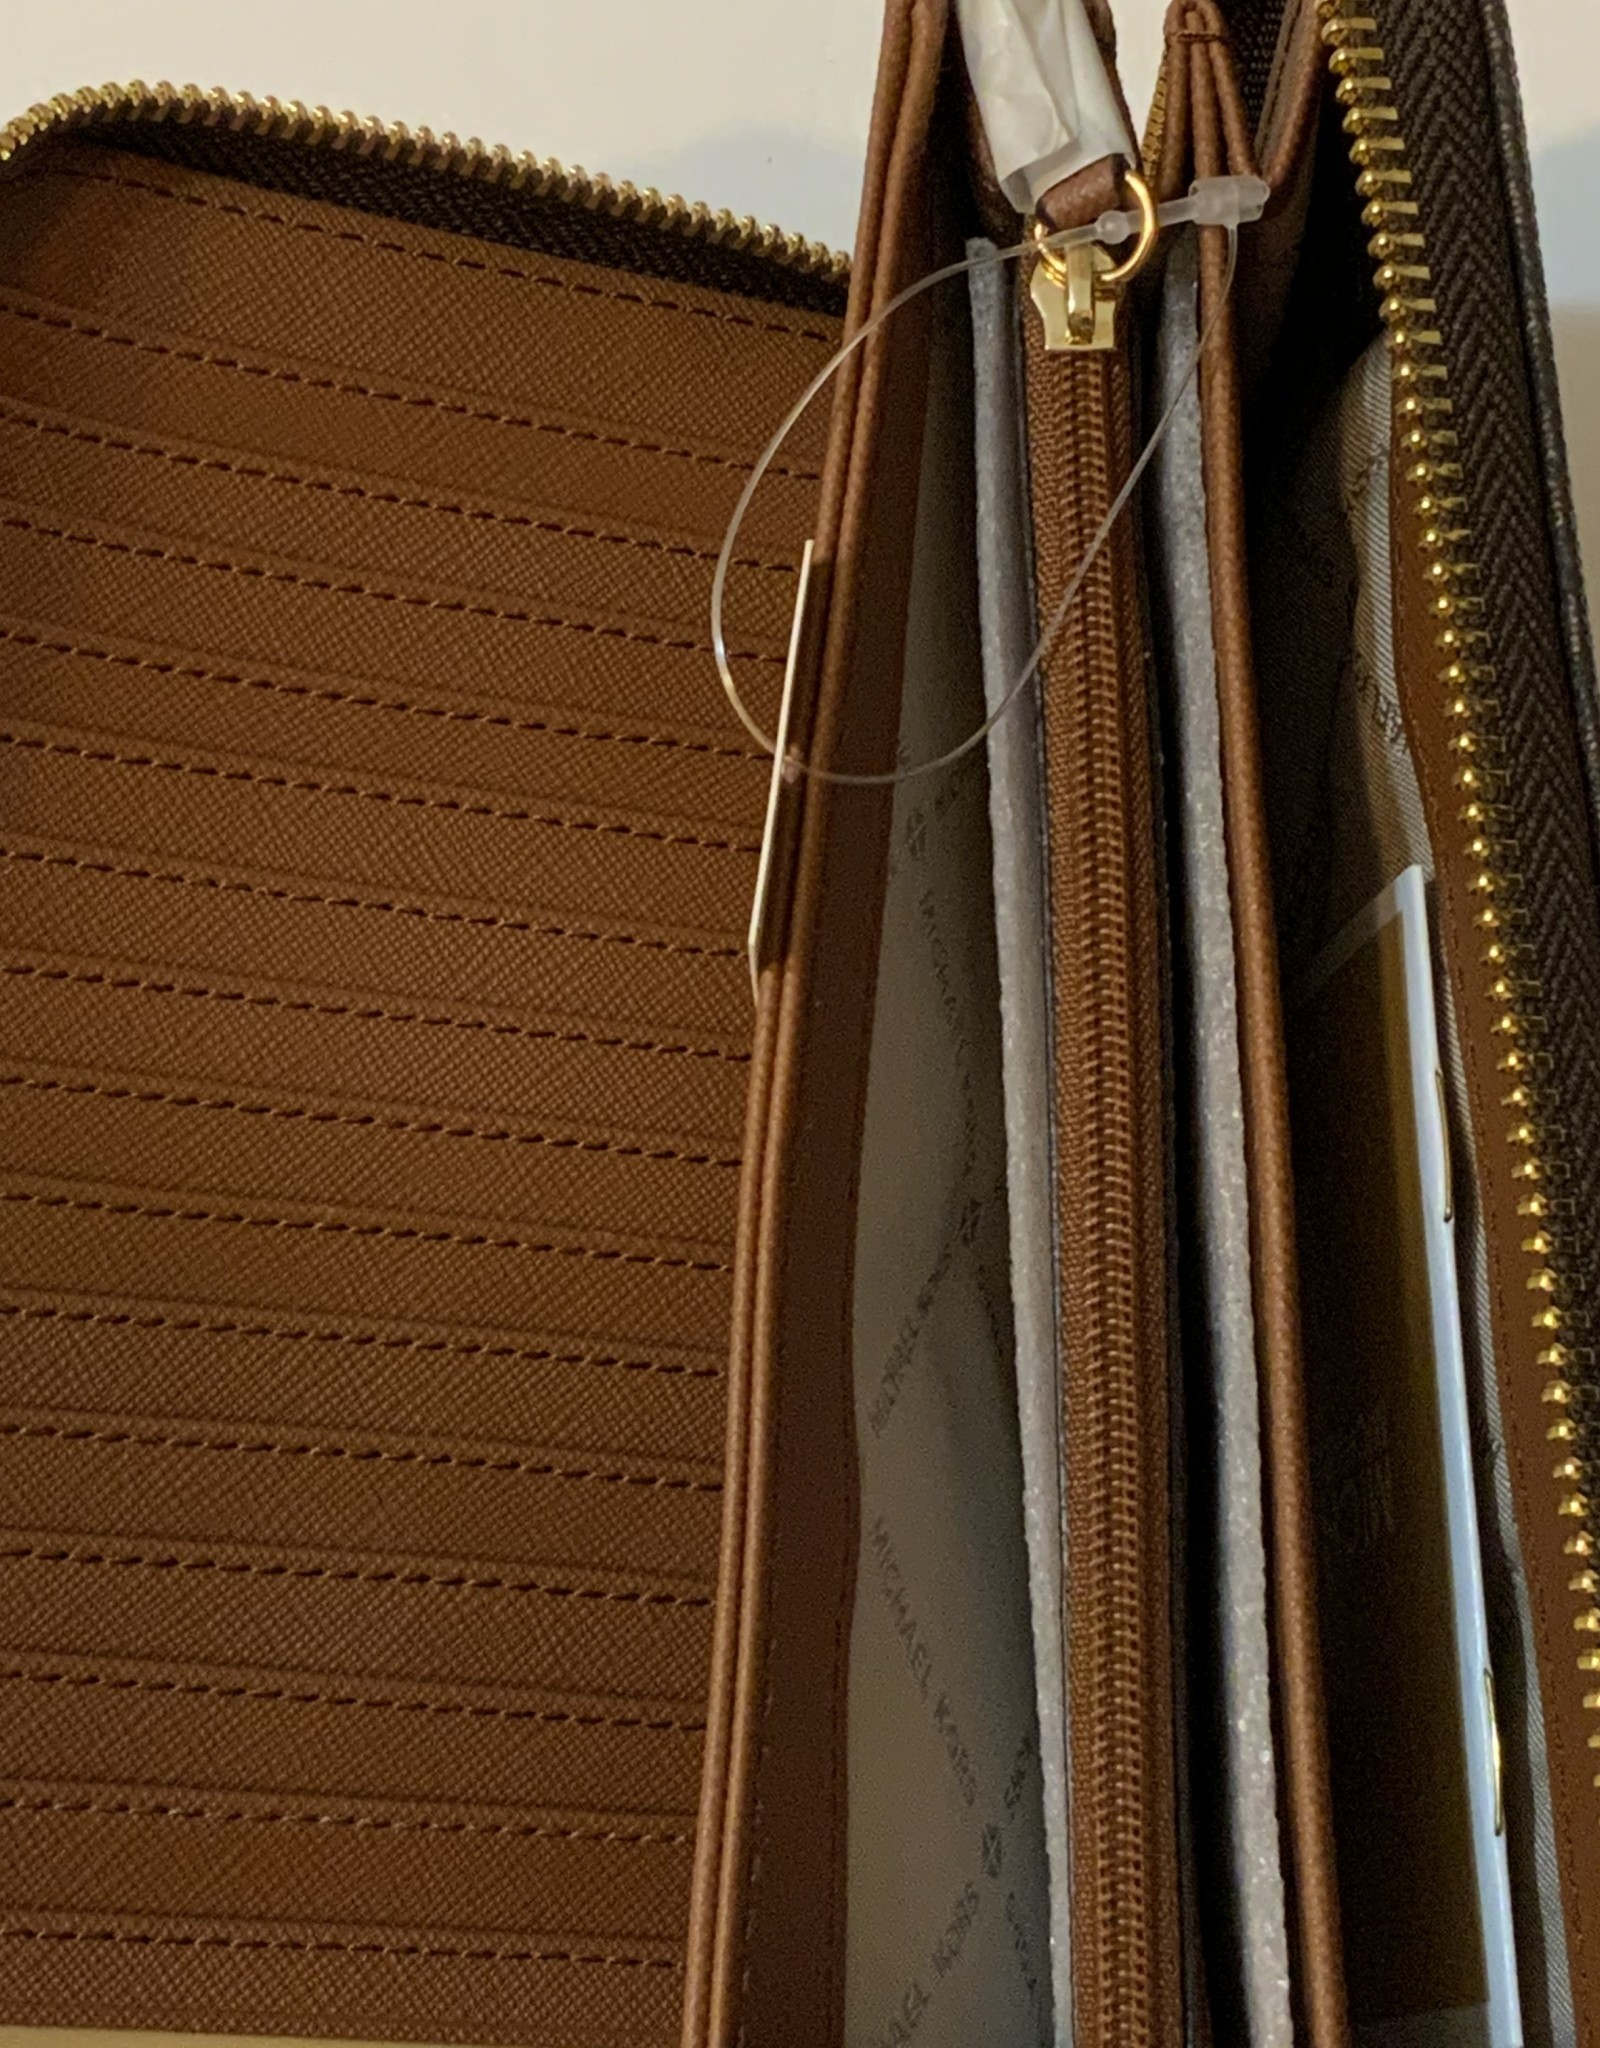 Michael Kors Michael Kors Travel Wallet Large  Jet Set Travel